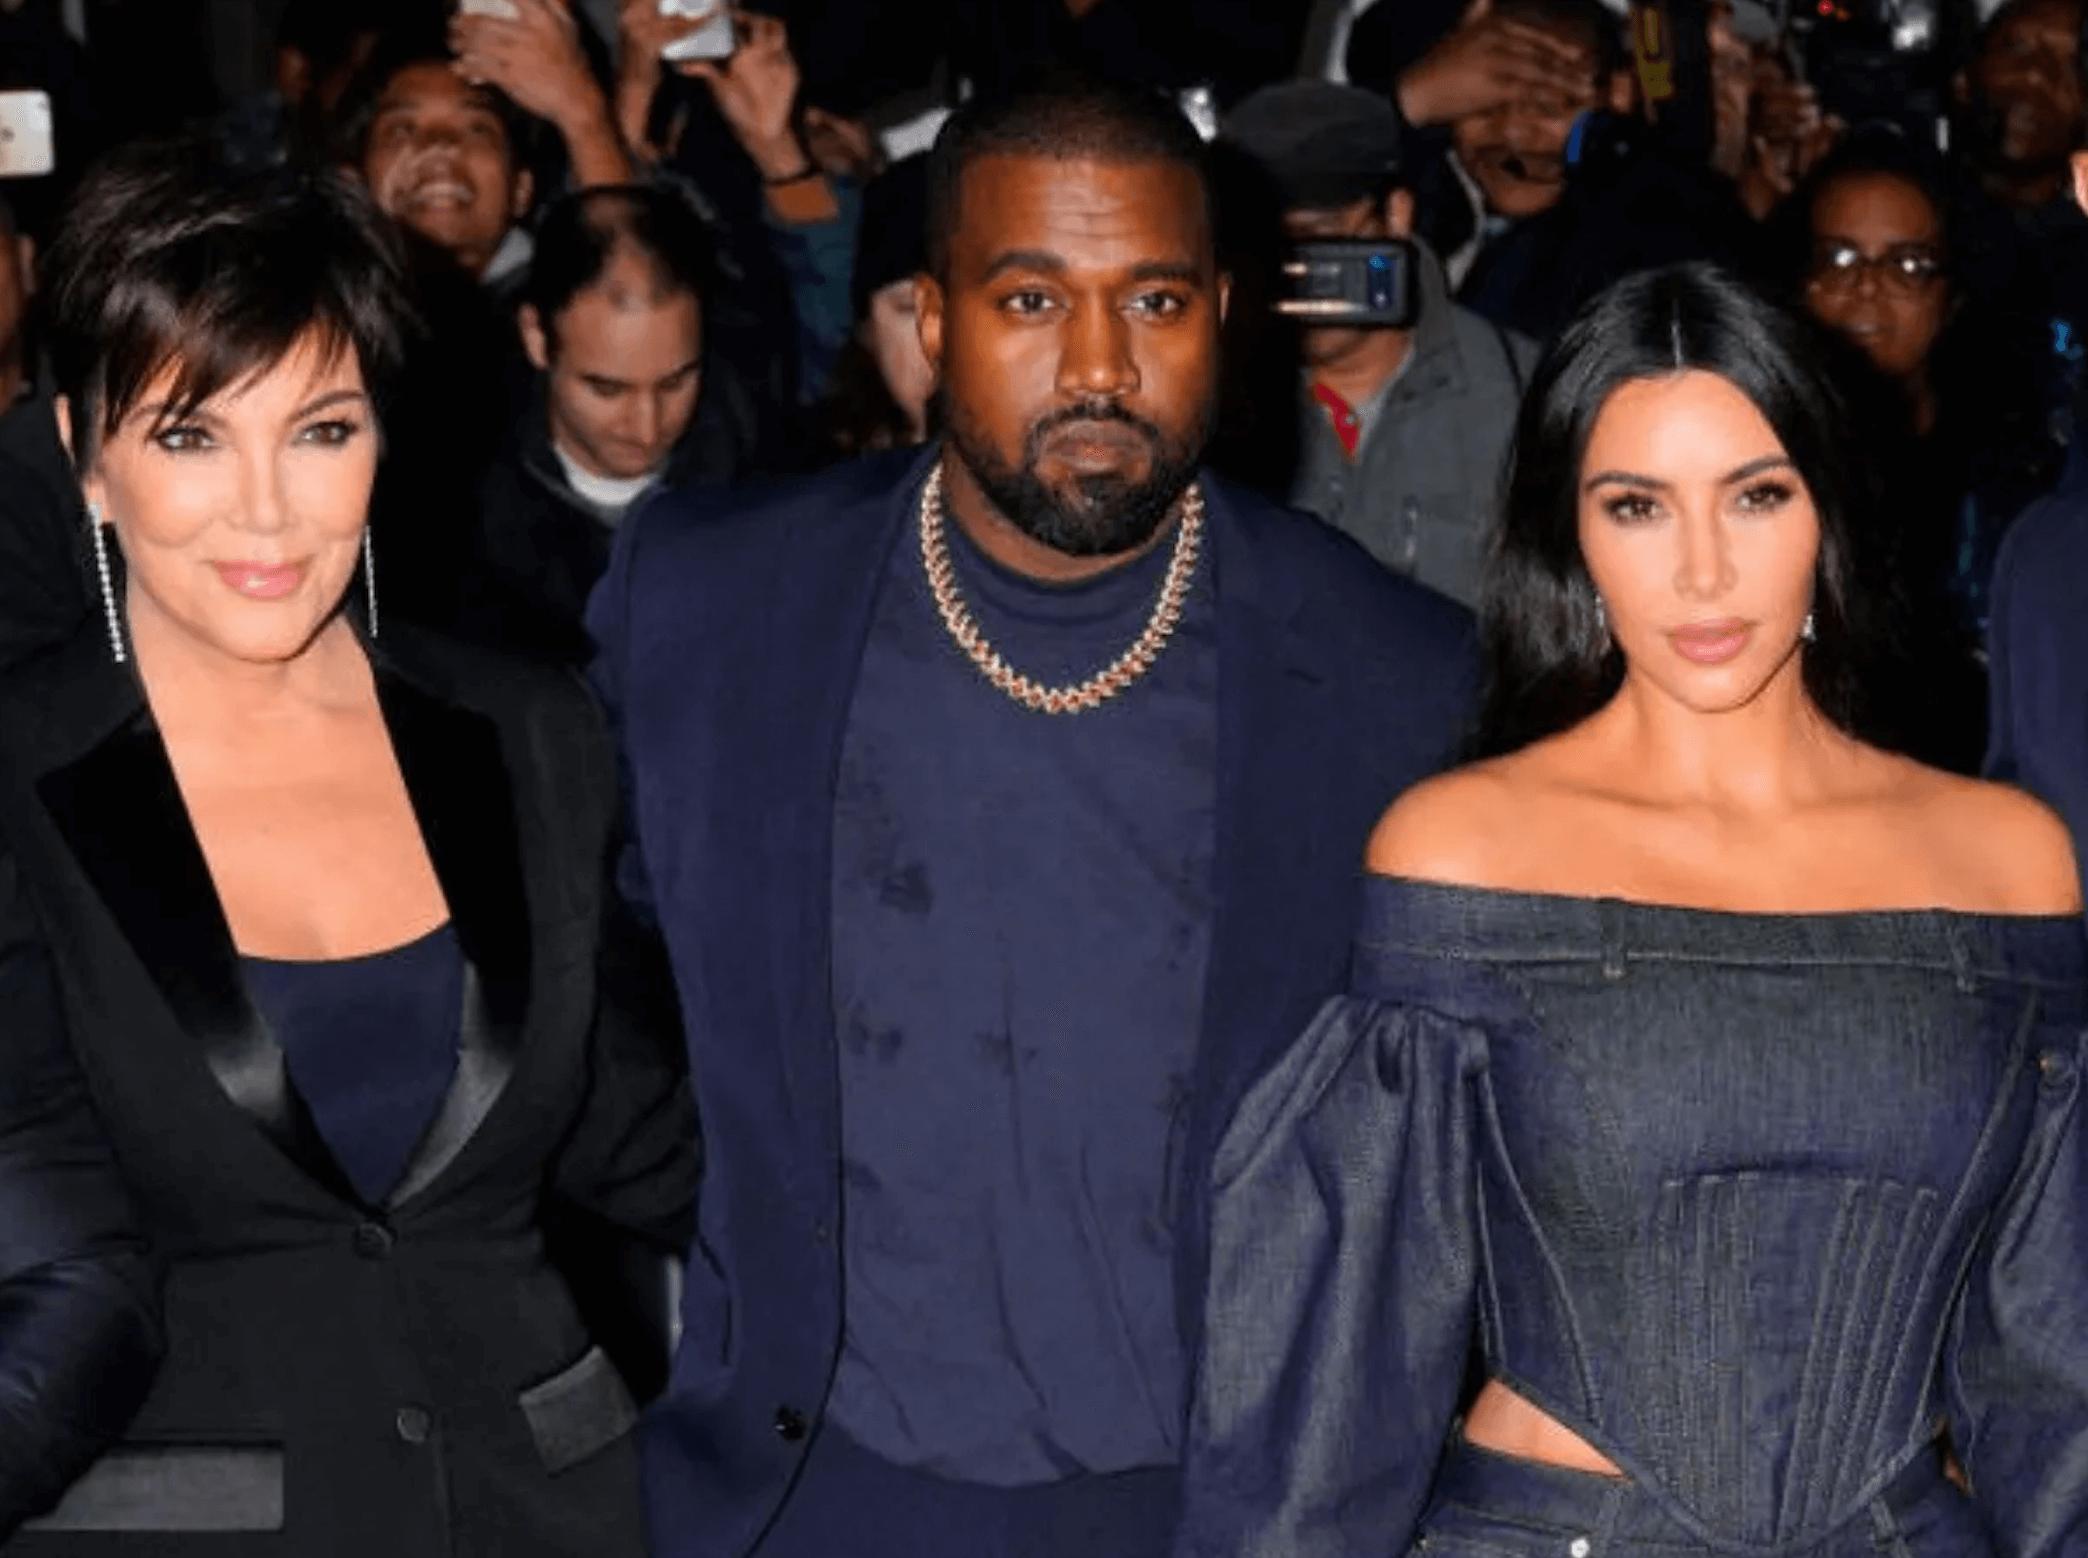 Kris Jenner, Kanye West, Kim Kardashian